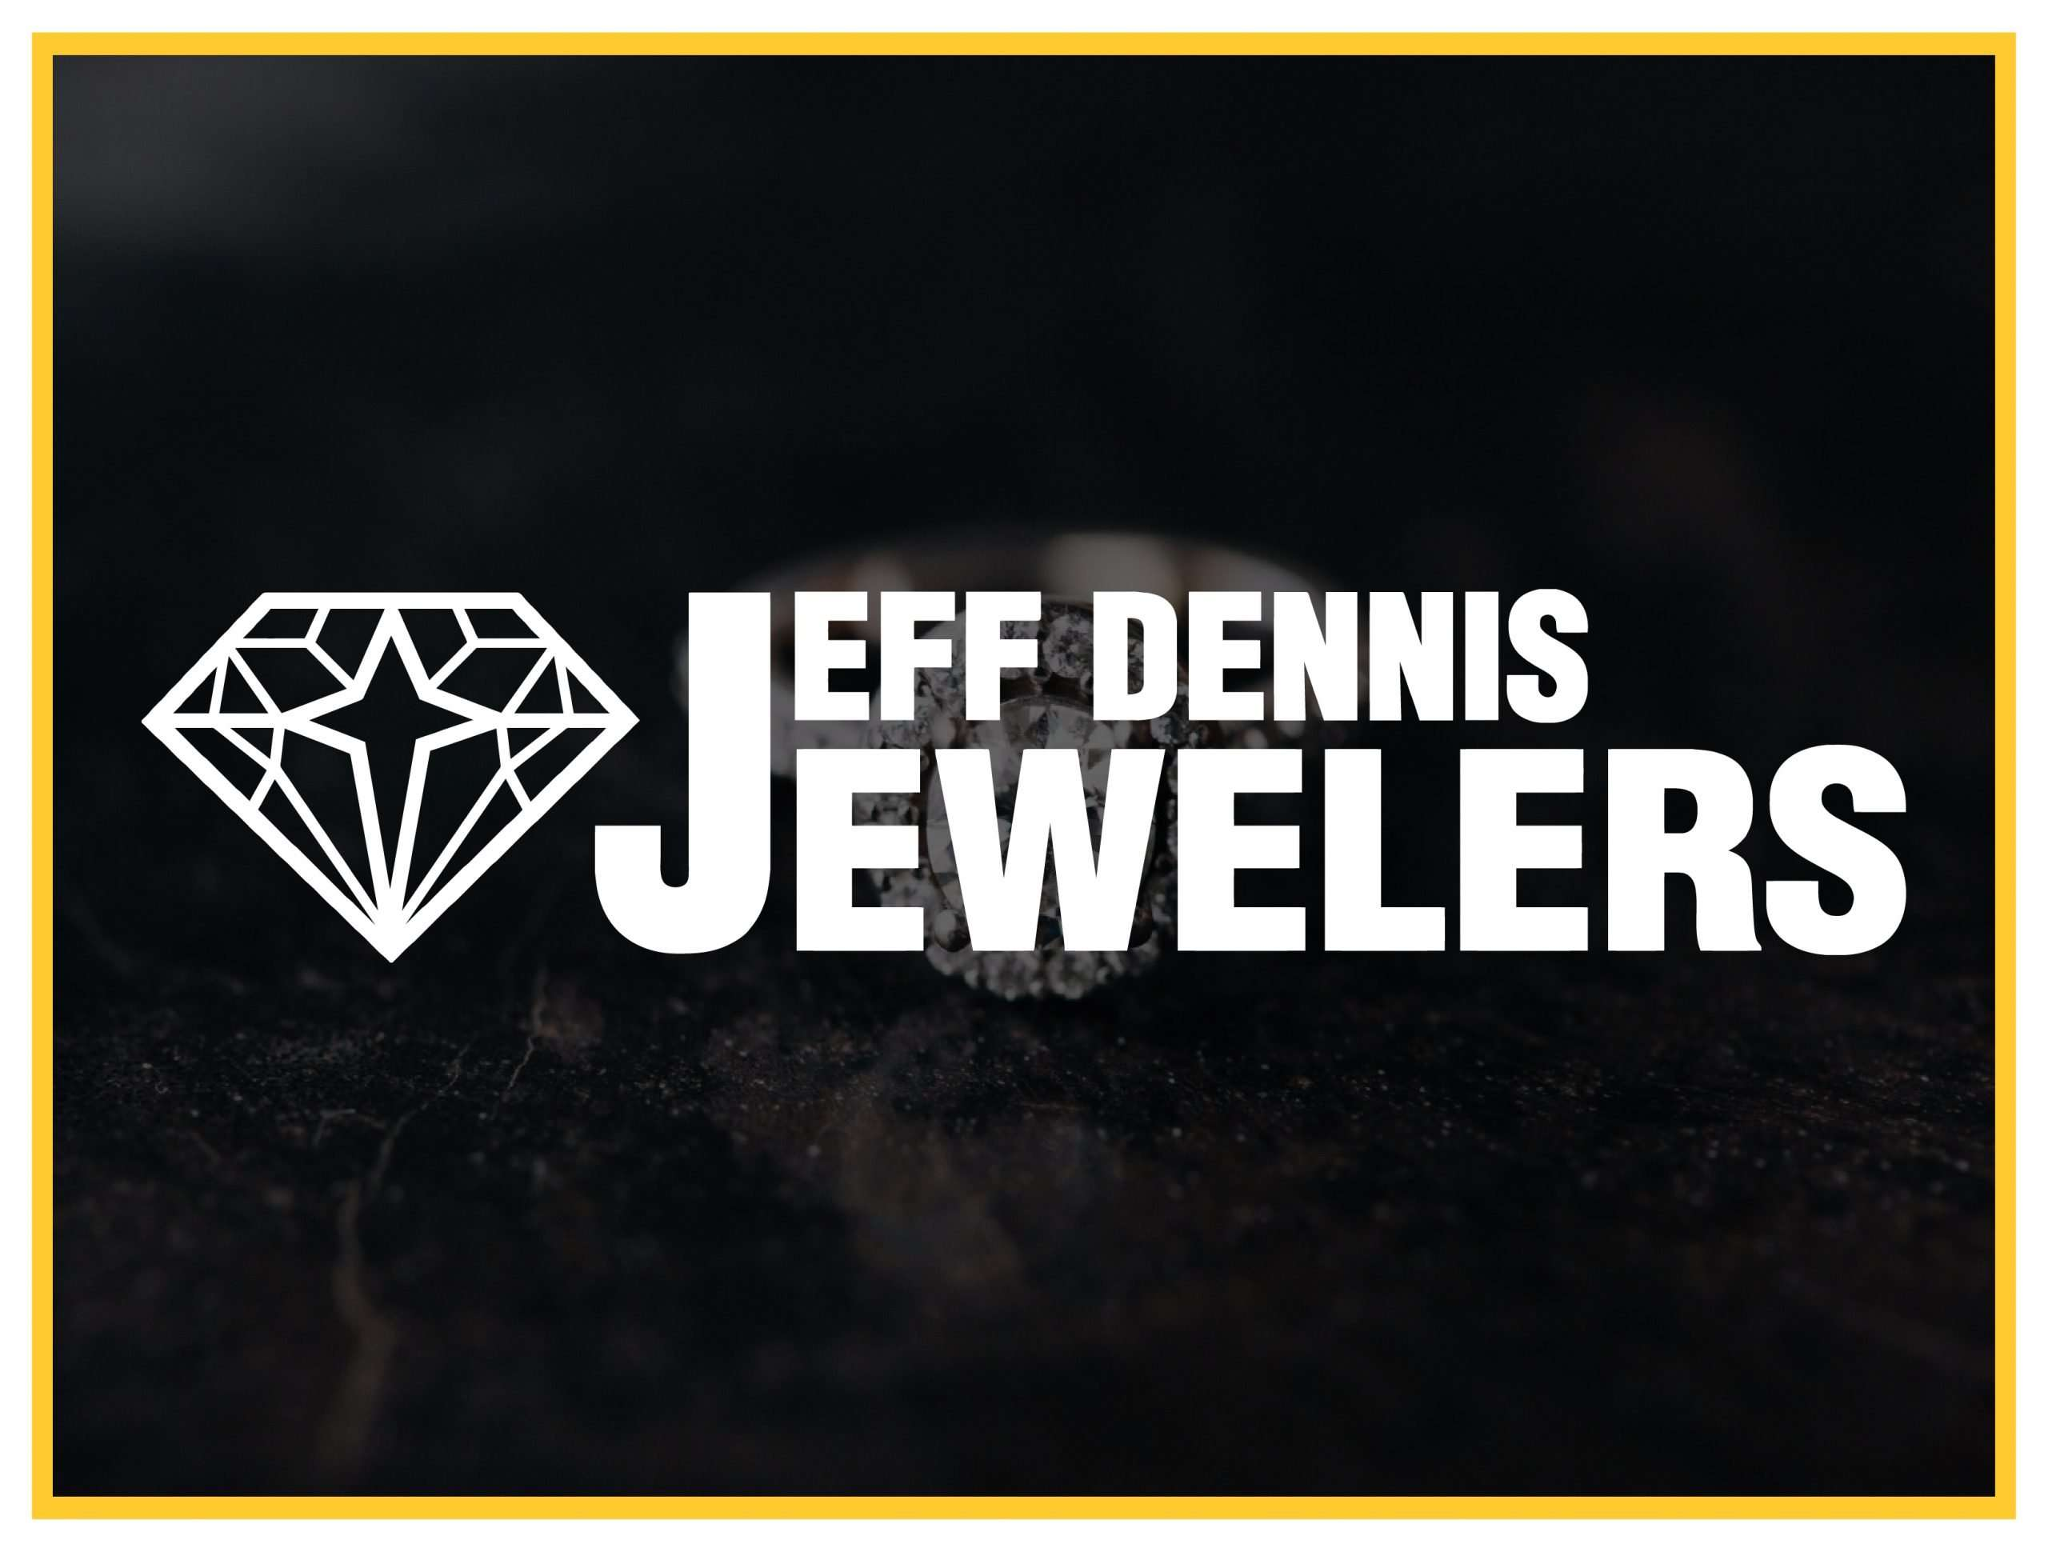 Dotedison_CS_Jeff Dennis Jewelers